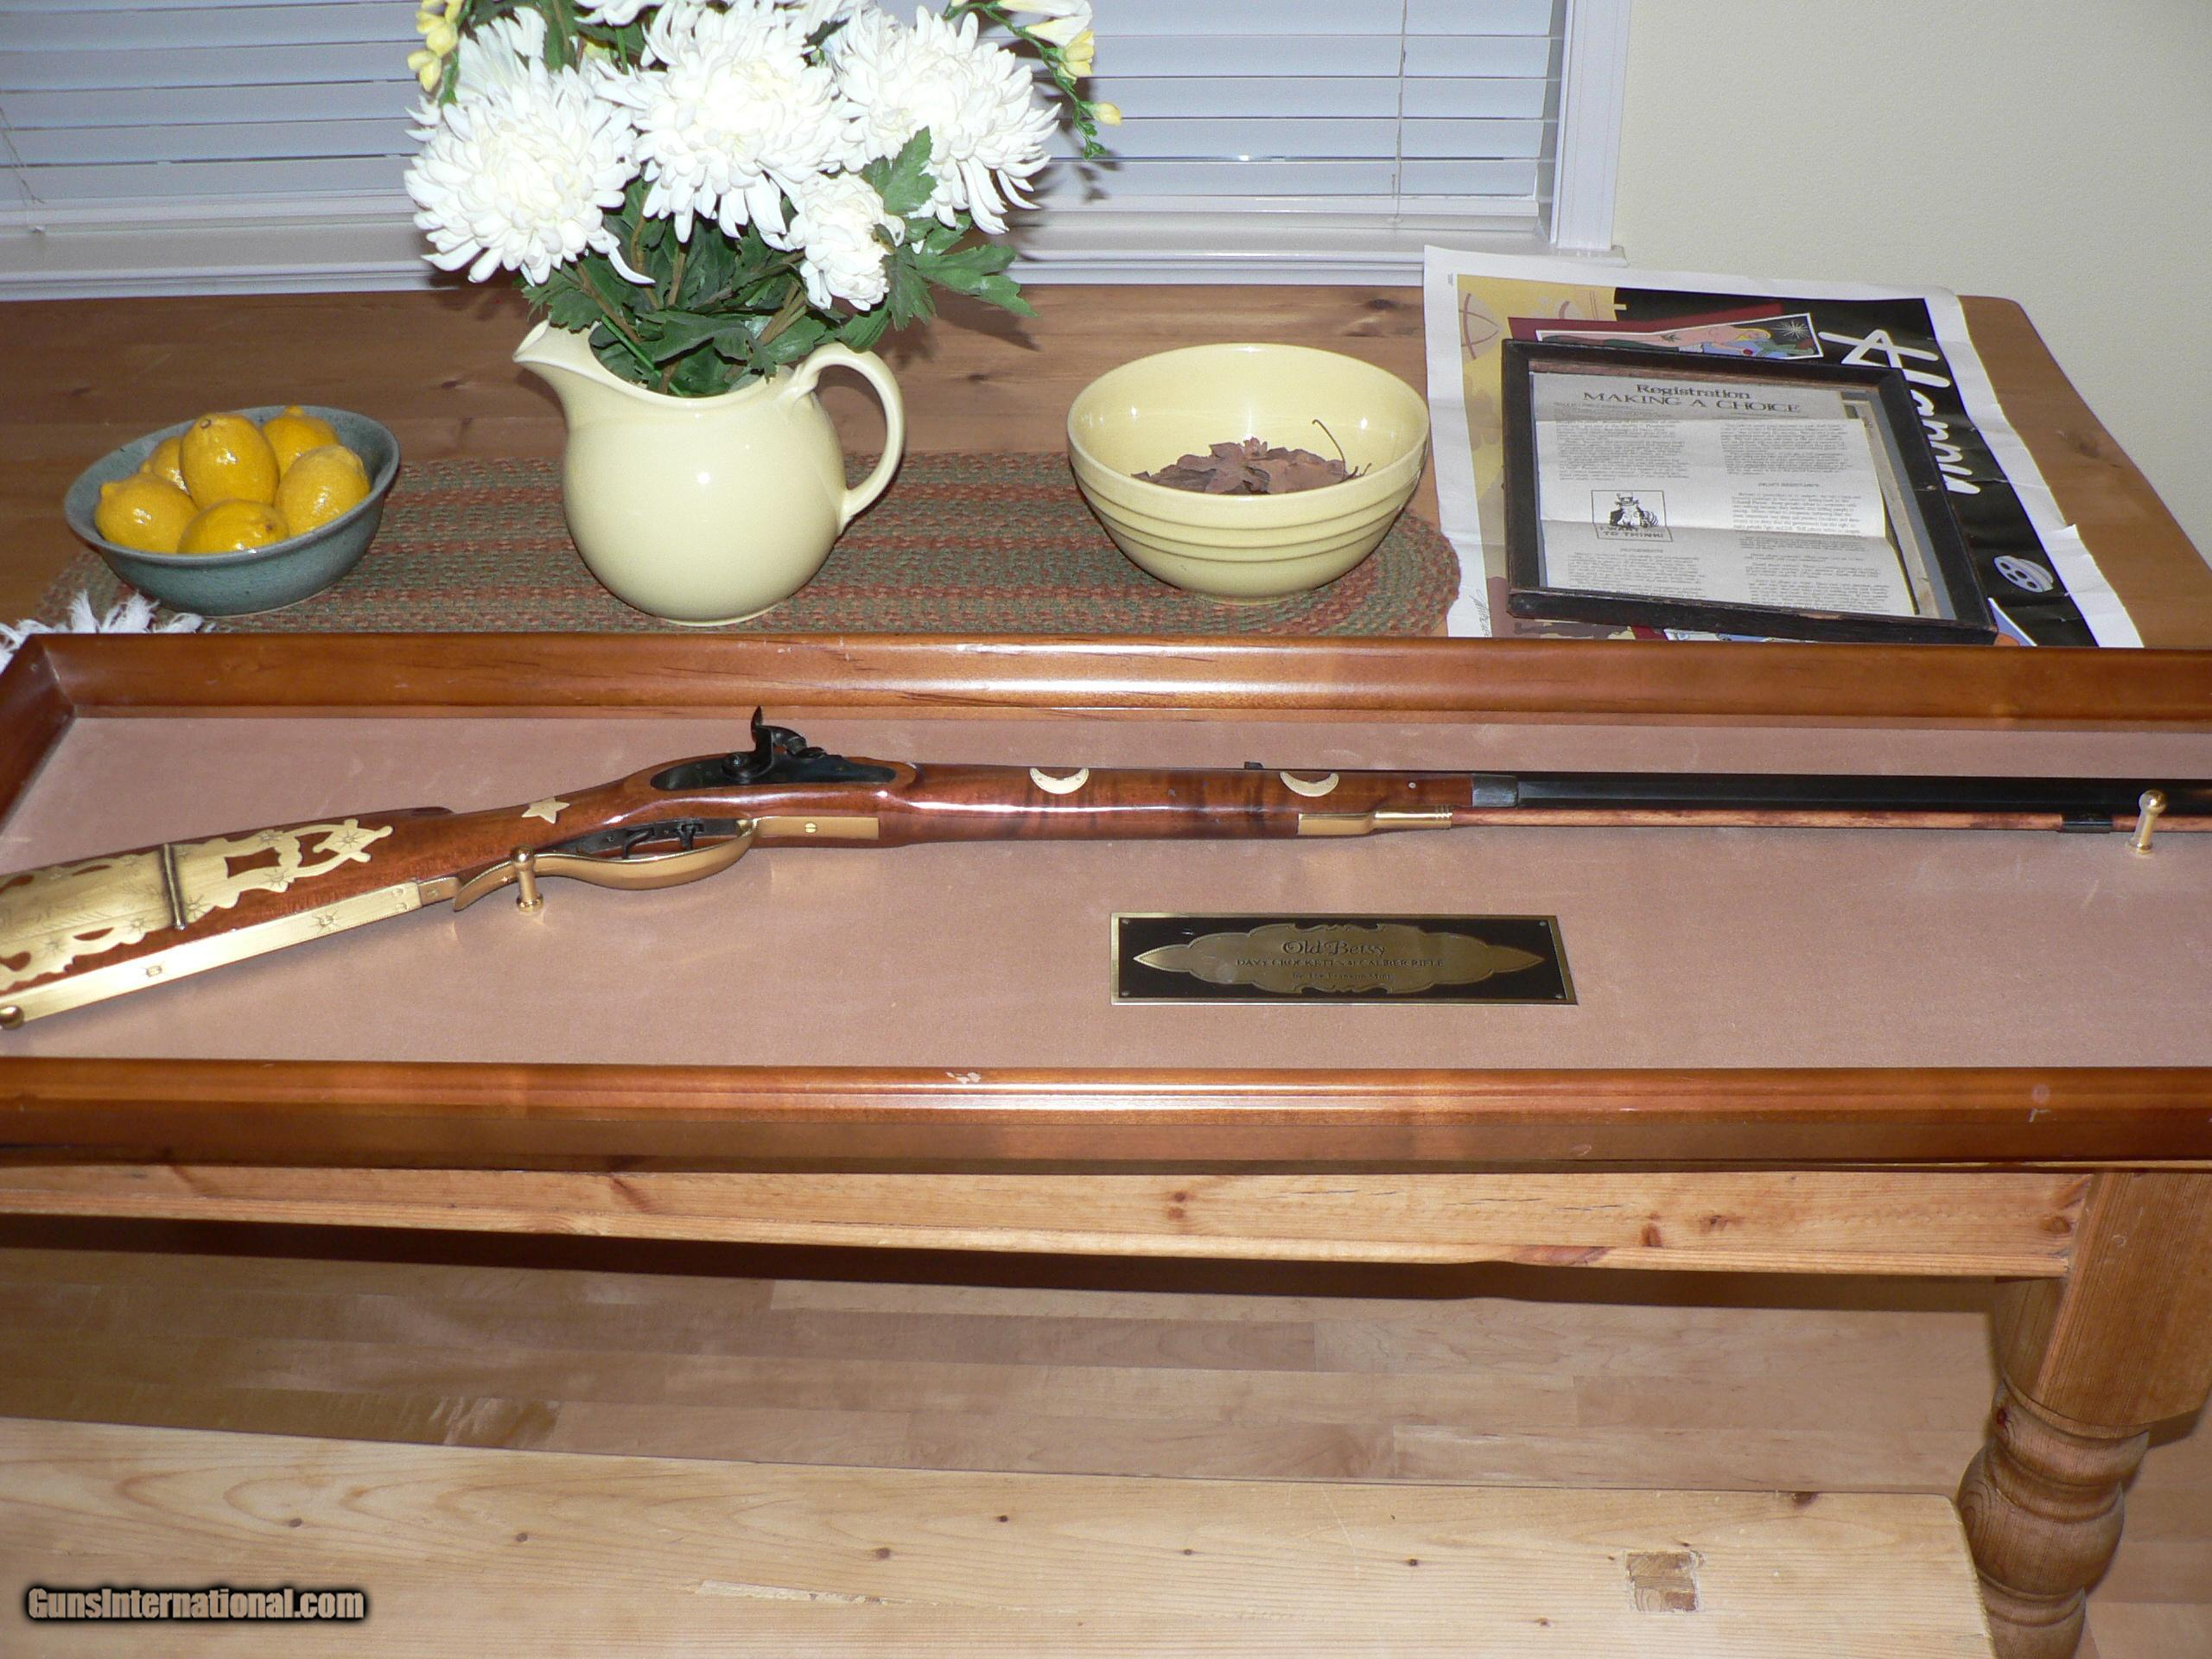 Franklin Mint replica of Davy Crockett s 1835 41 cal rifle